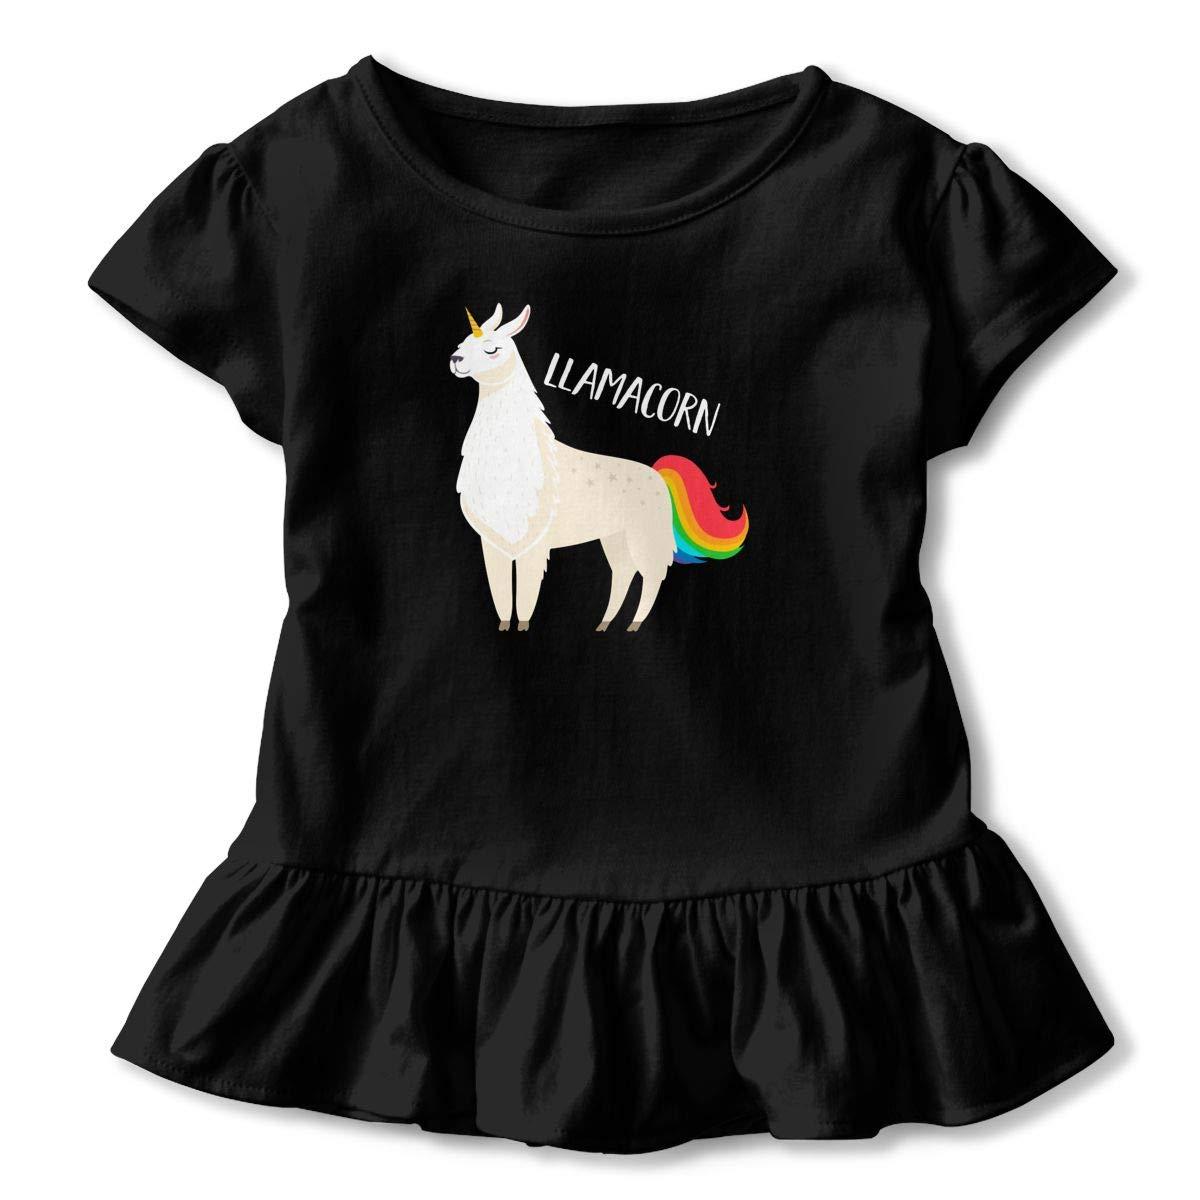 Llama Unicorn Toddler Baby Girls Cotton Ruffle Short Sleeve Top Soft T-Shirt 2-6T